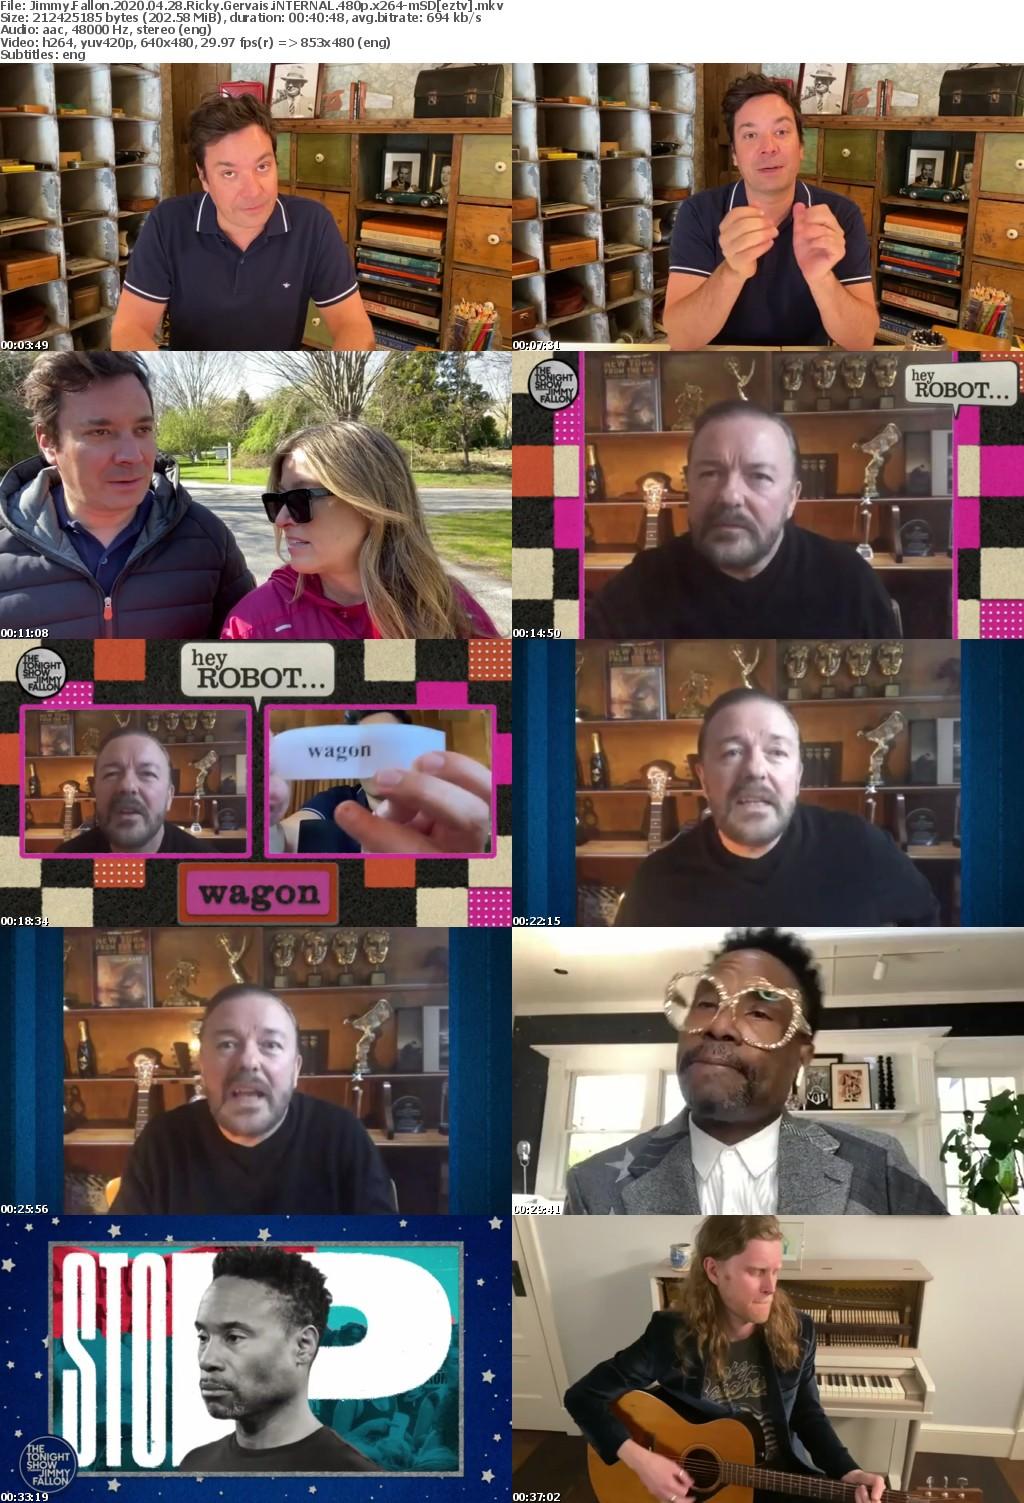 Jimmy Fallon 2020 04 28 Ricky Gervais iNTERNAL 480p x264-mSD